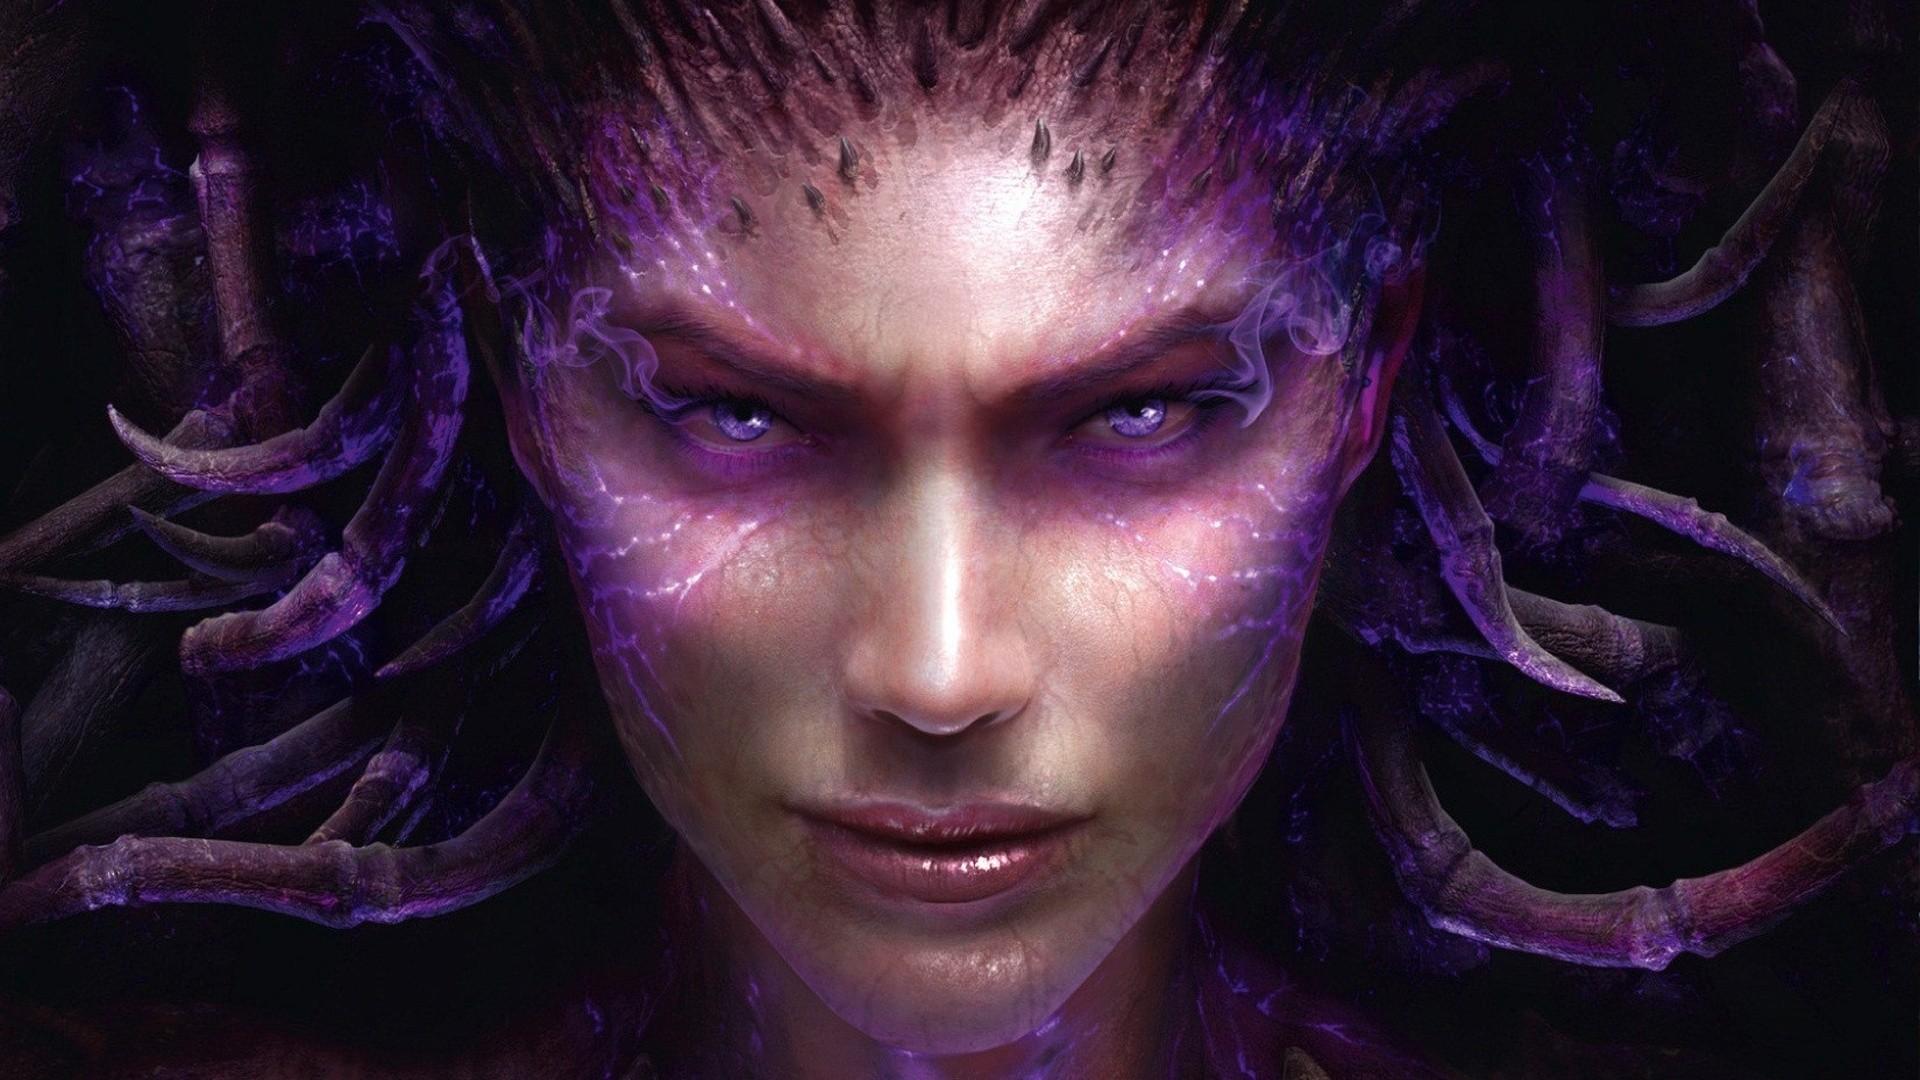 Heart of Swarm Sarah Kerrigan Queen Of Blades Starcraft Star Craft 1920x1080